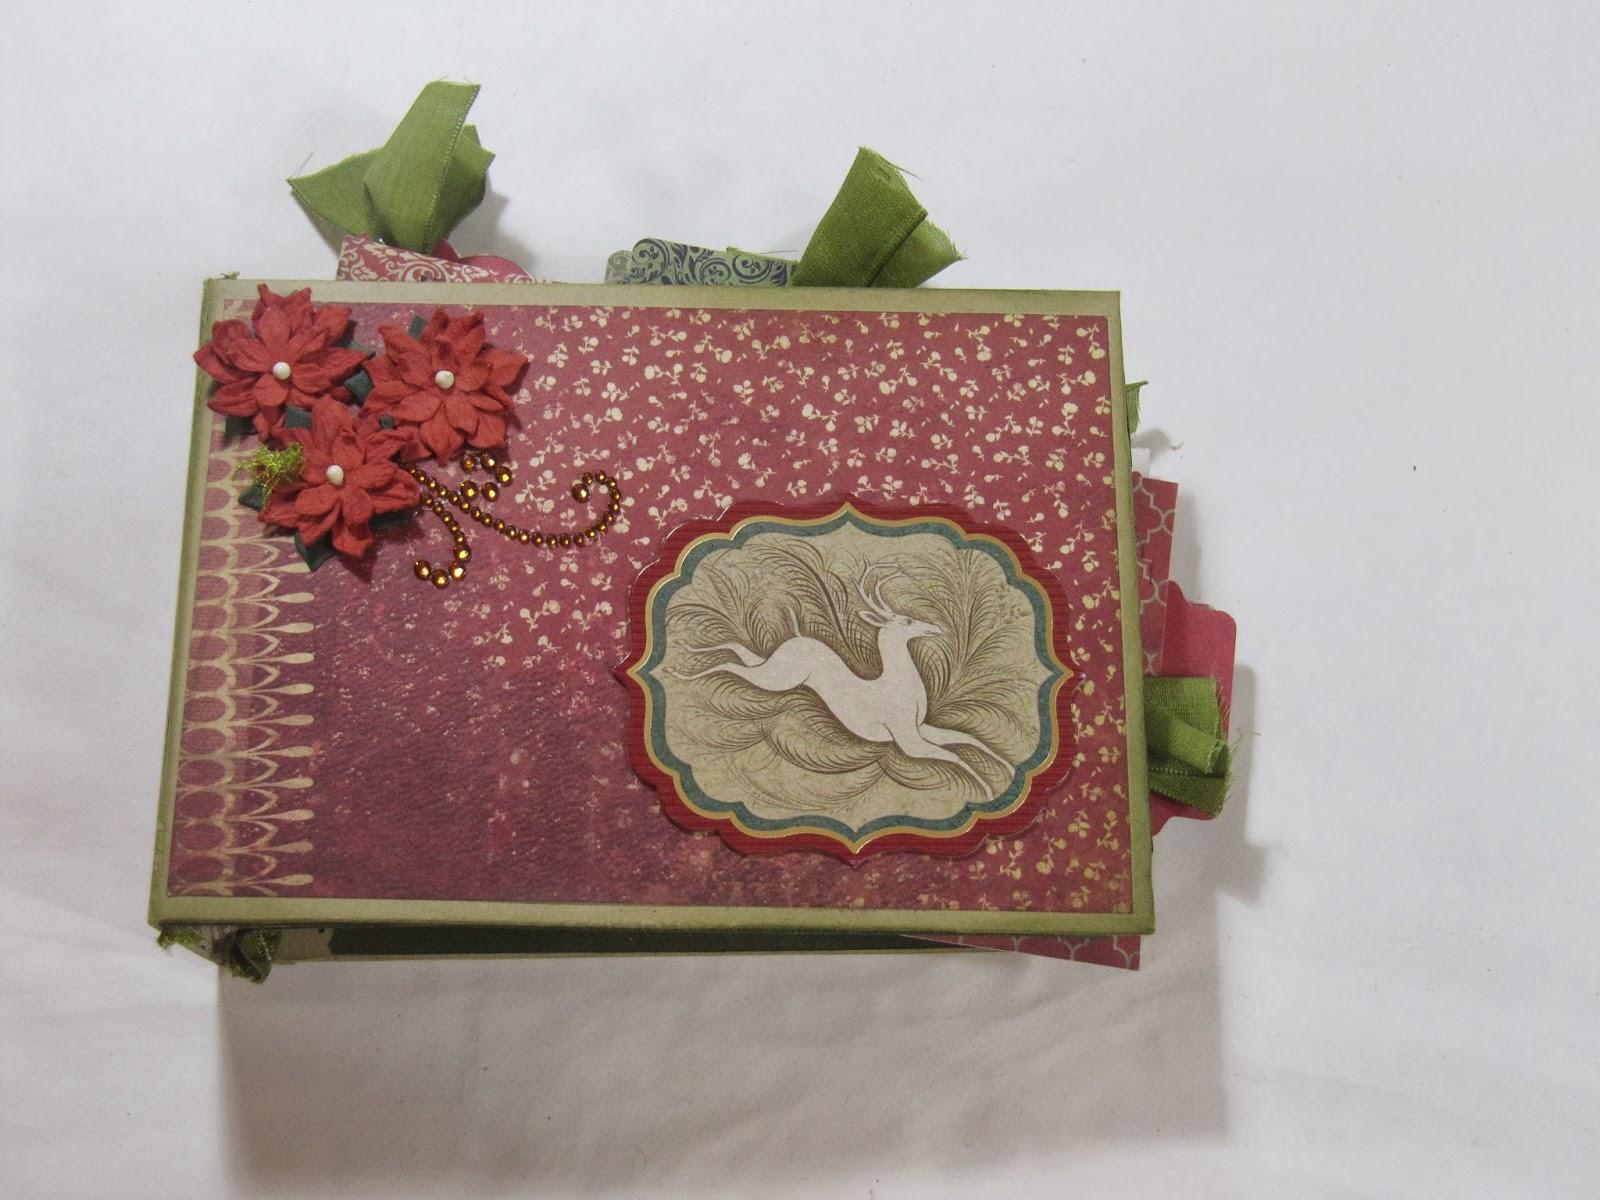 Vintage Scrapbook Cover : Sunshine creations and crafts mini scrapbook album